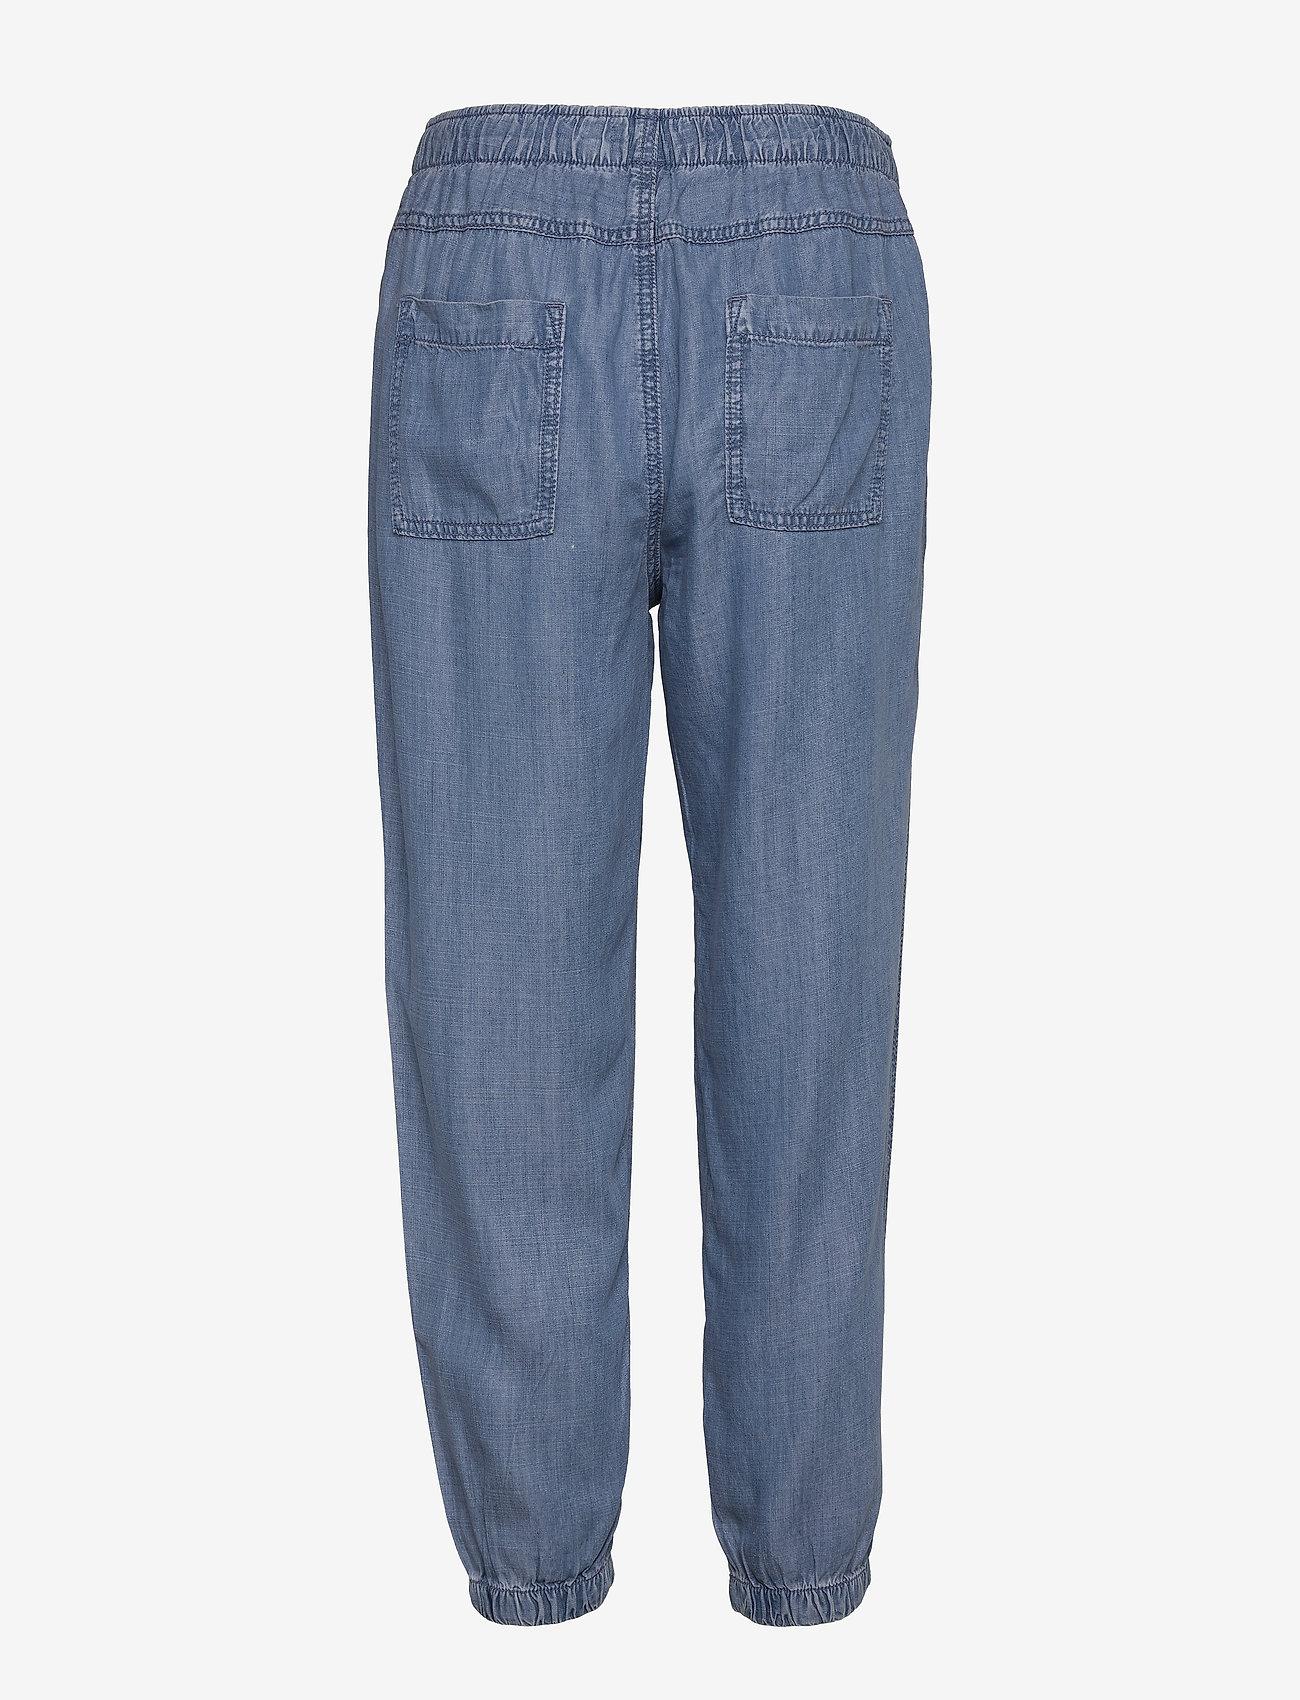 Pants Denim (Blue Medium Wash) (349.99 kr) - Esprit Casual